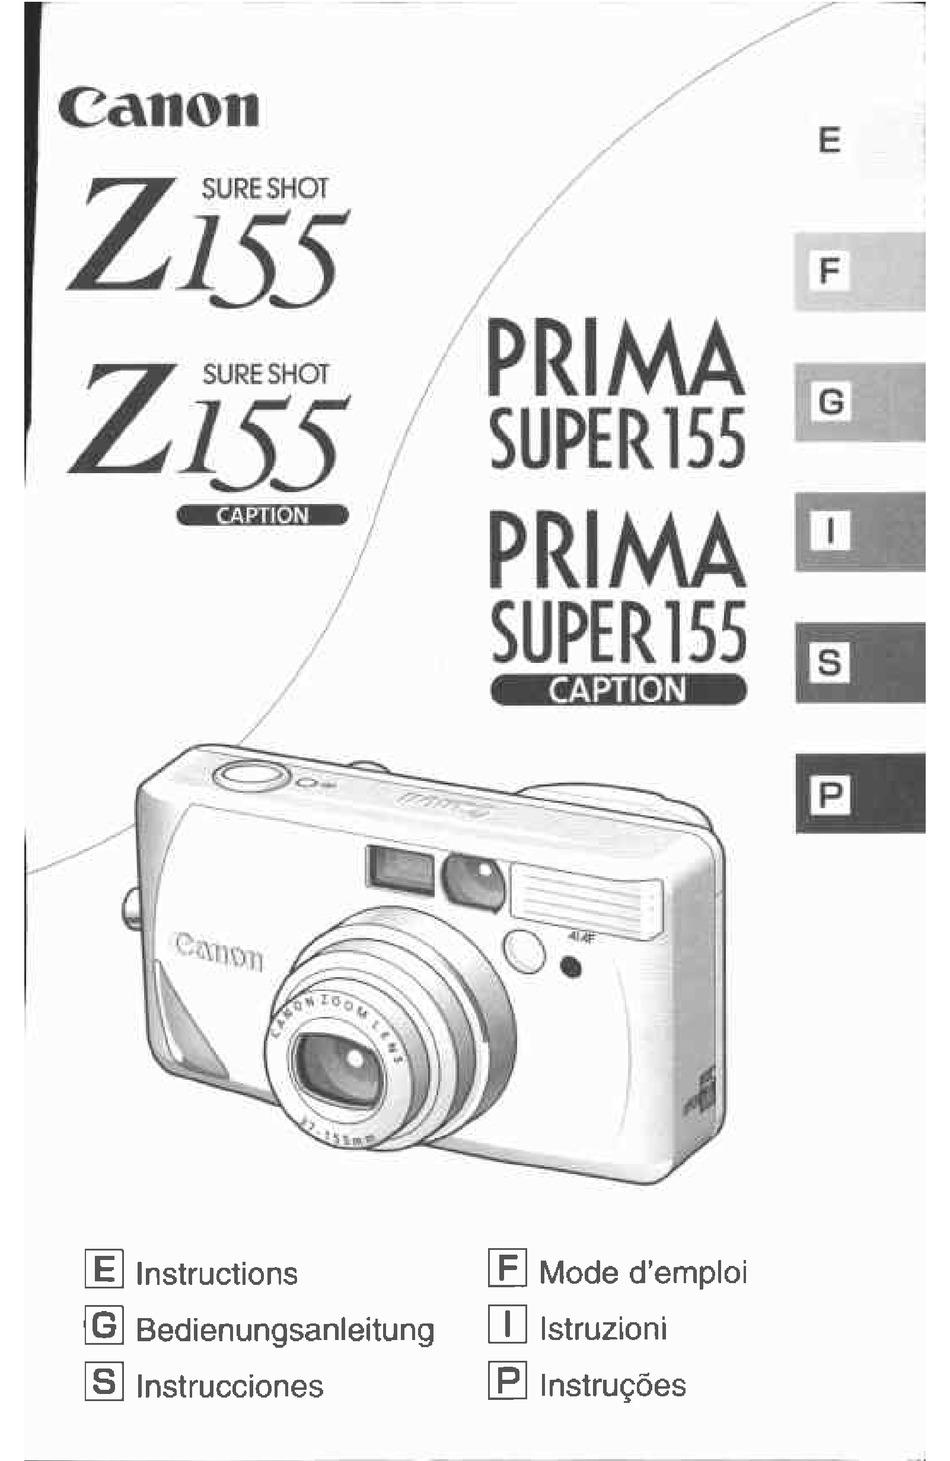 Canon Sure Shot Z155 Caption Date Zoom 35mm Camera Film Cameras ...